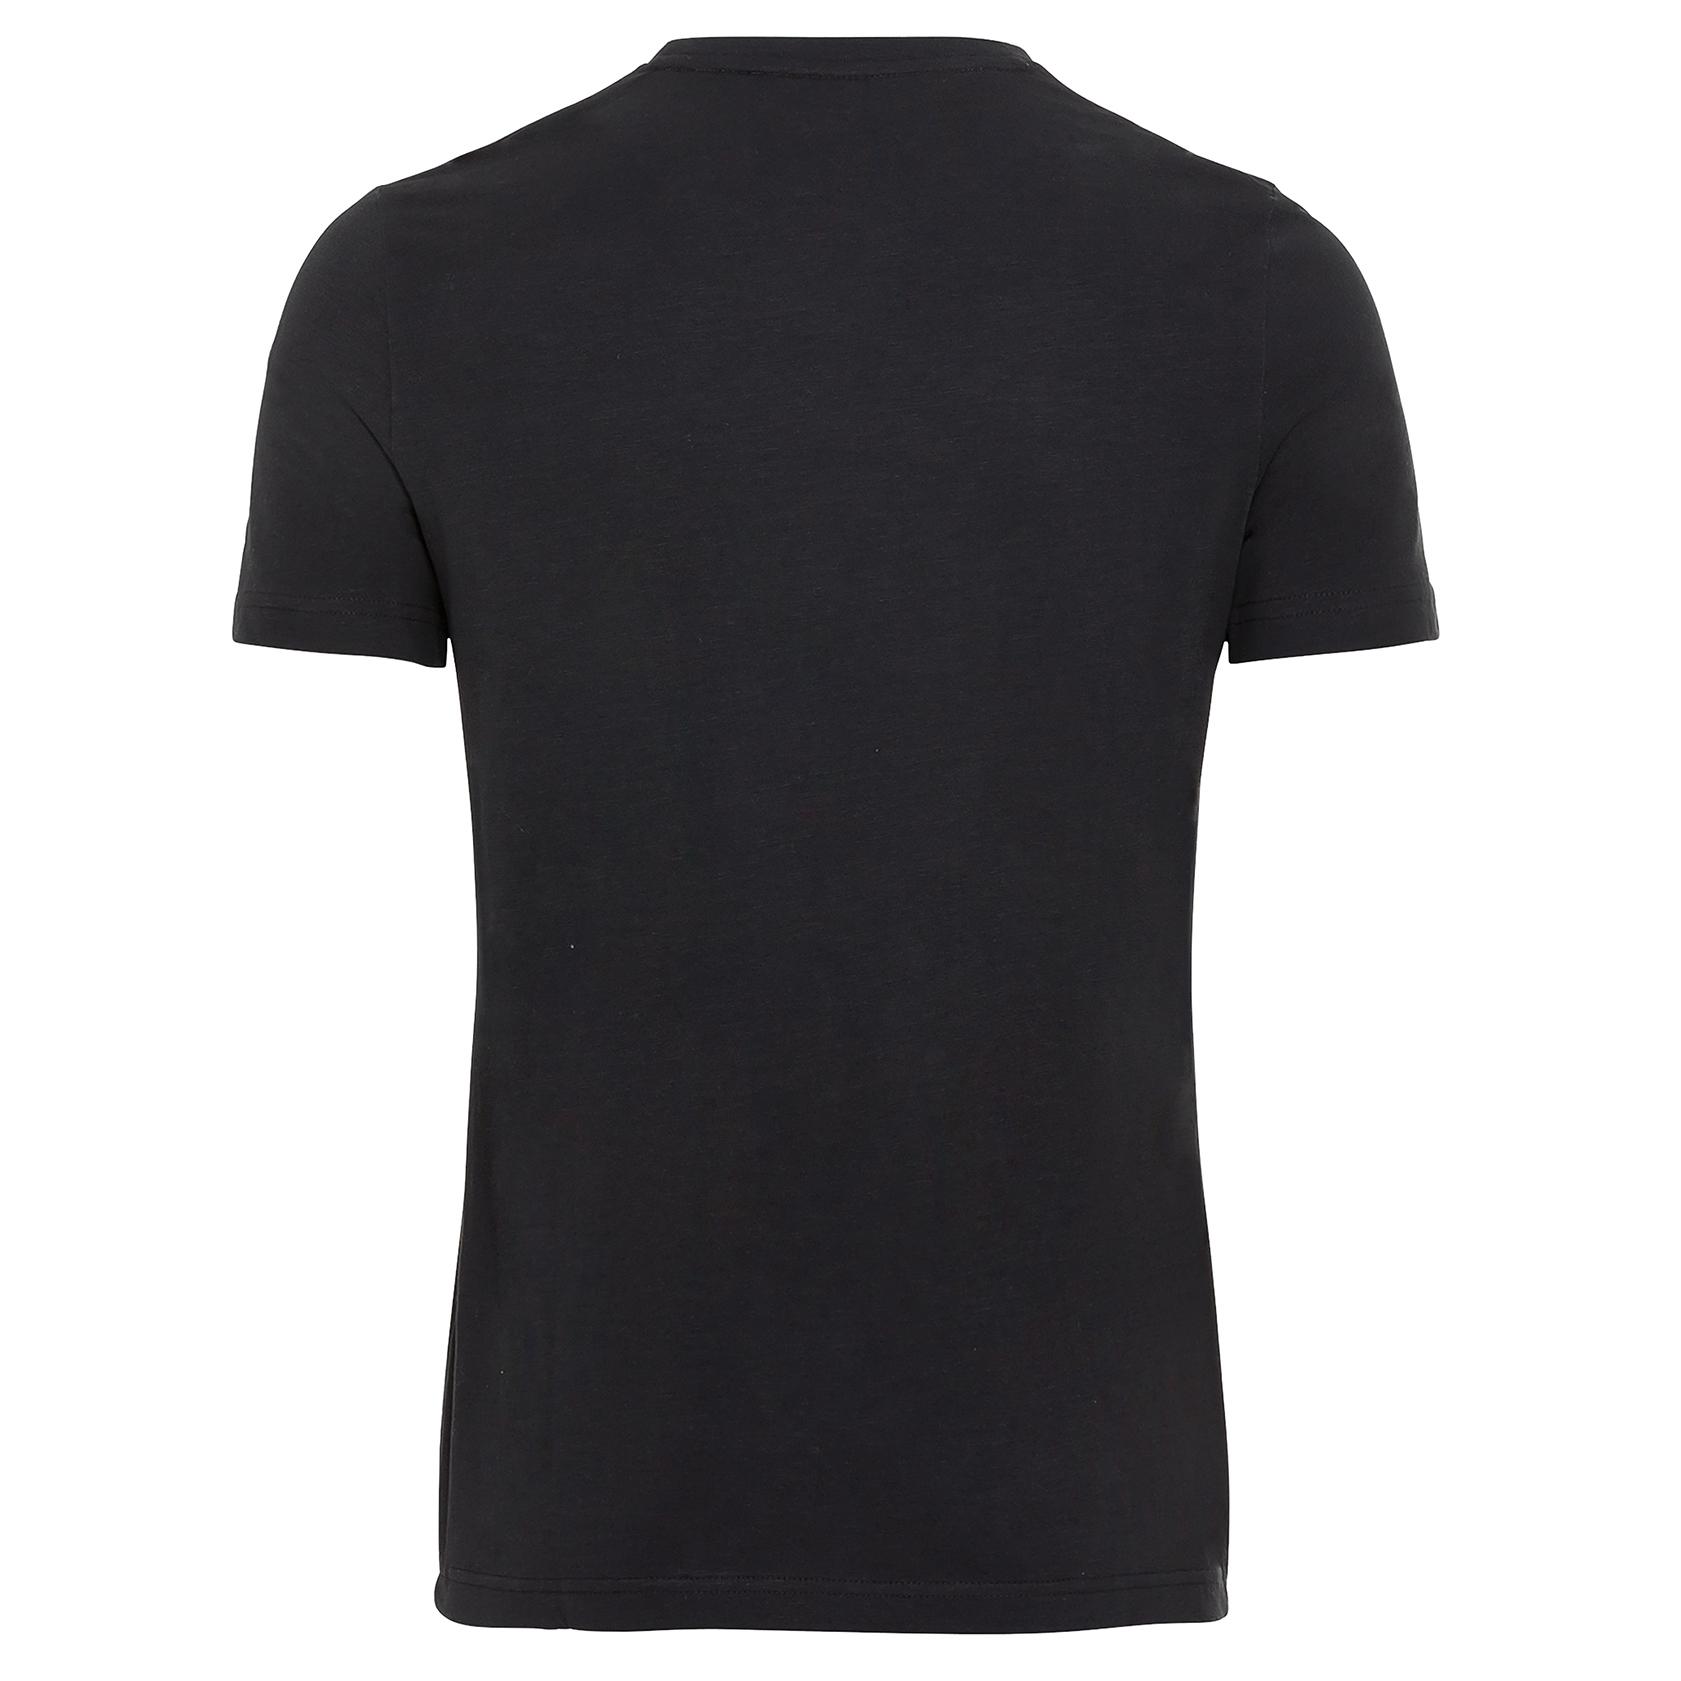 Camel active Herren T-Shirt Shirt kurzarm schwarz Print 5T42409642 88